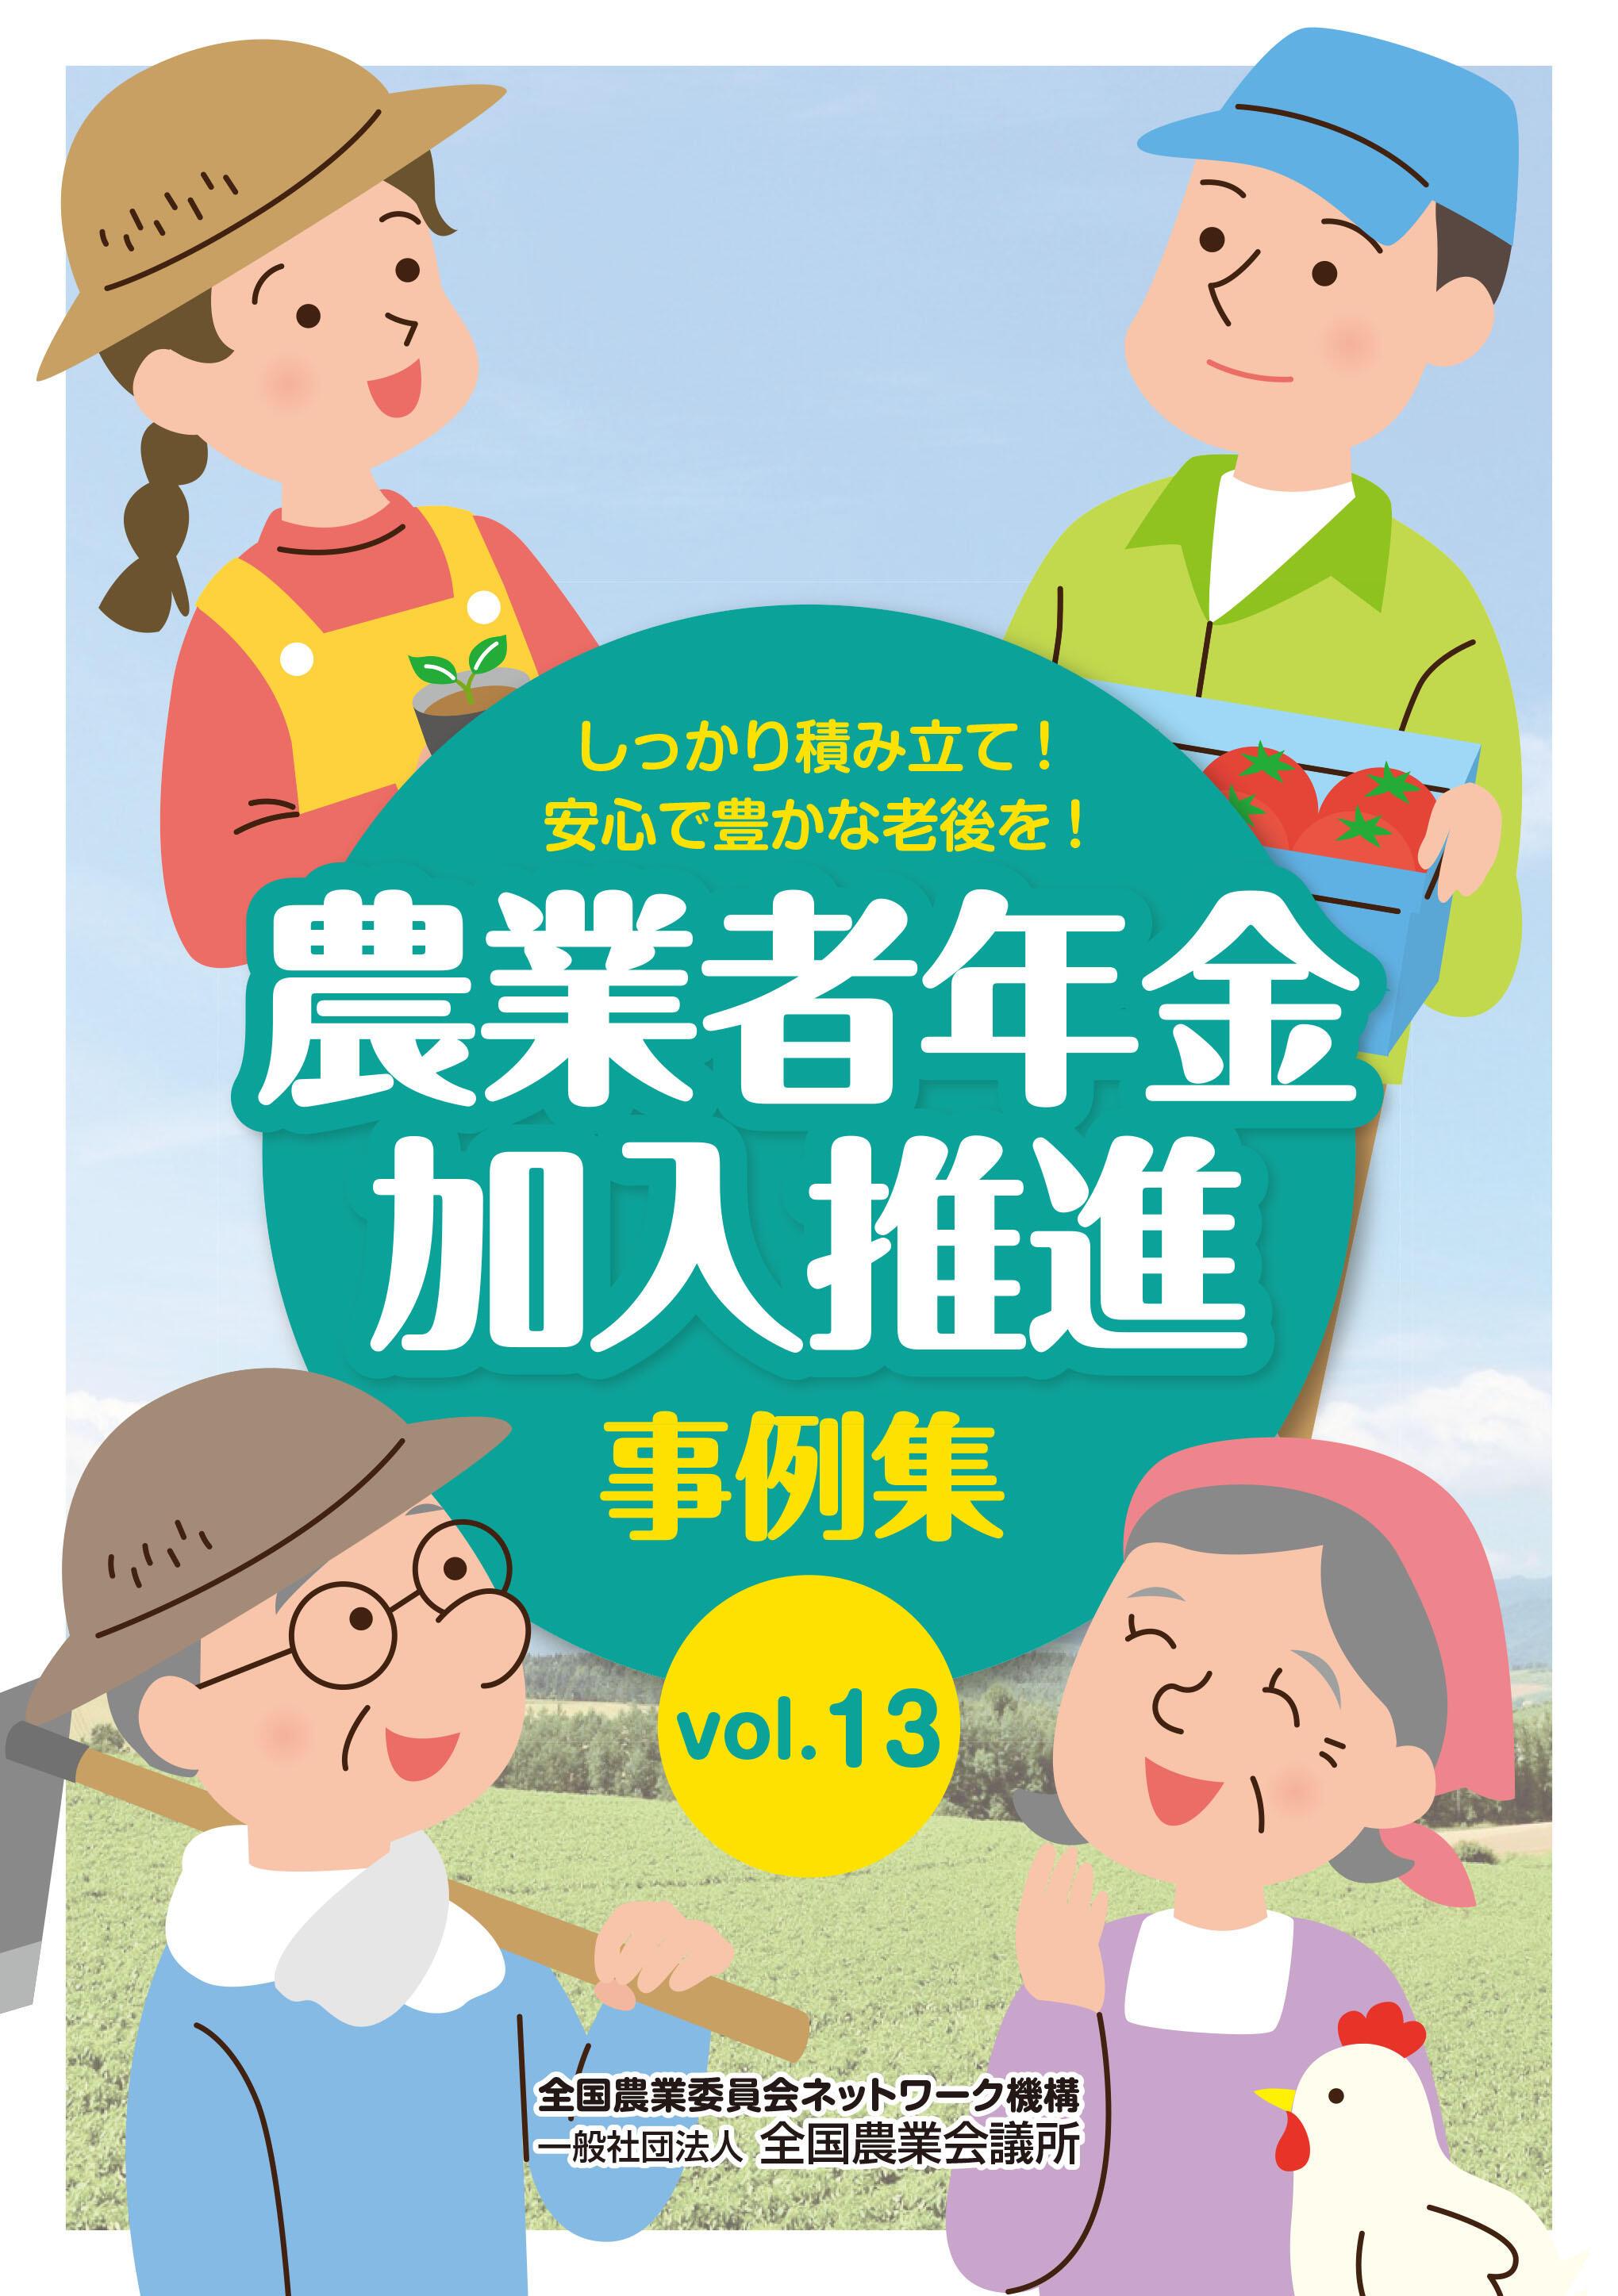 R02-29 農業者年金加入推進事例集 vol.13_表紙.jpg